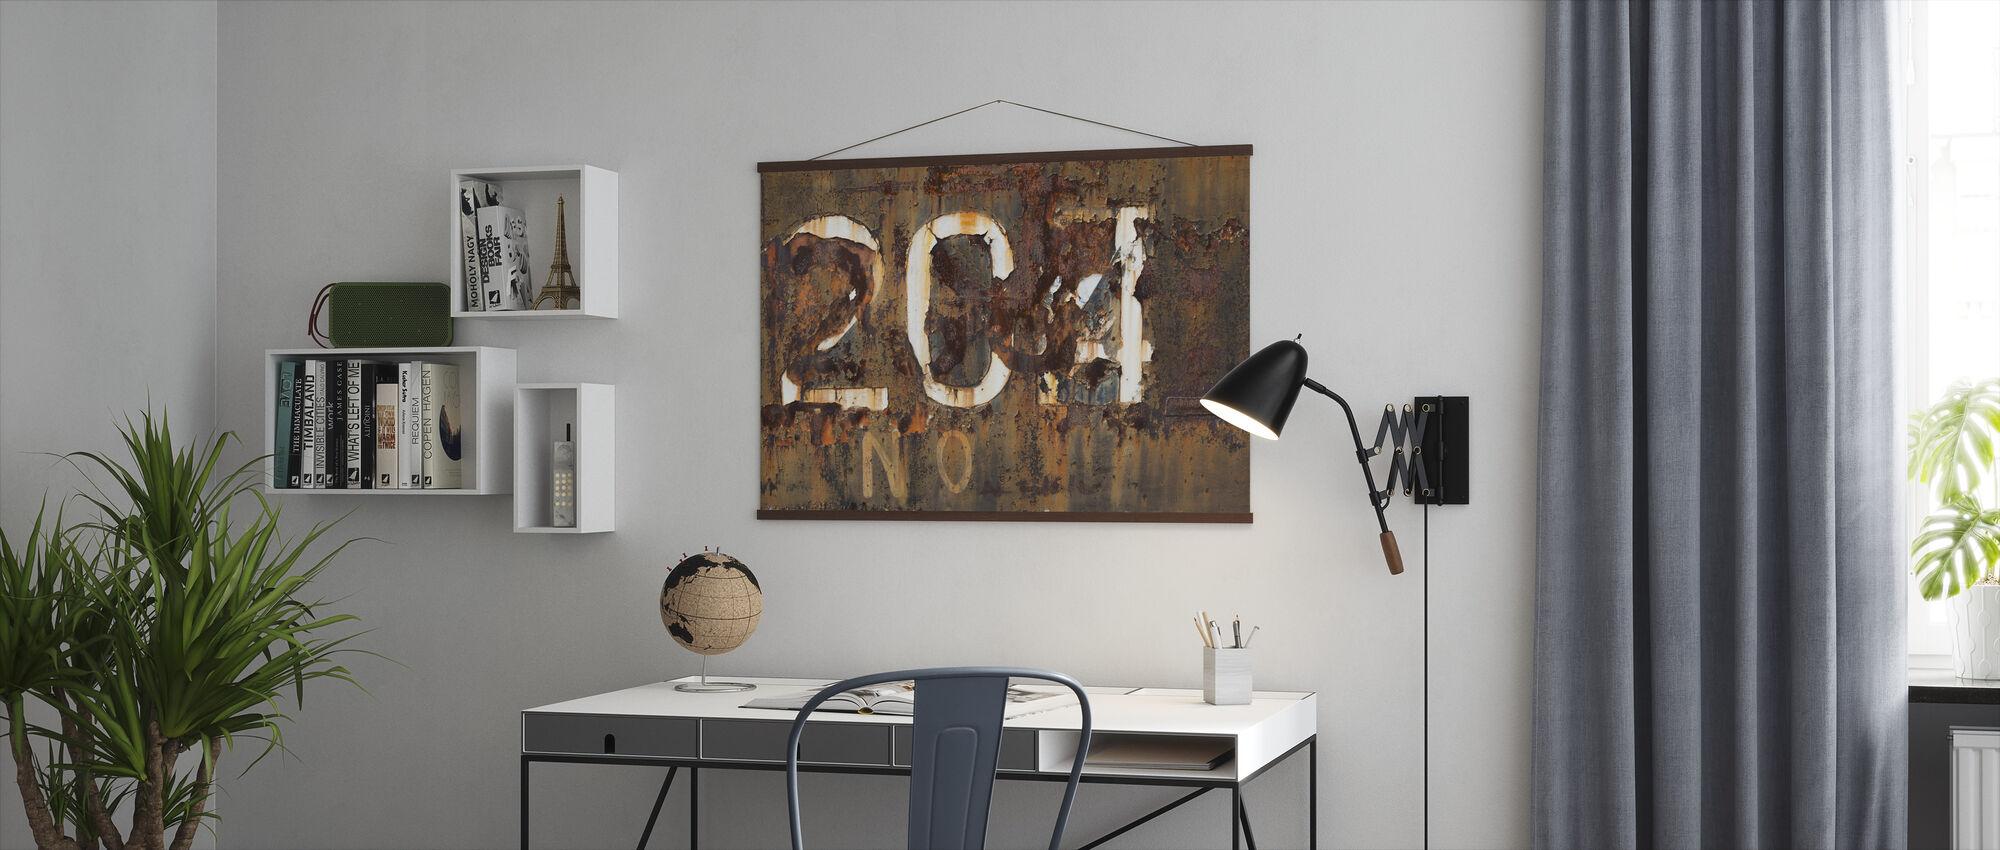 Rusten gammel overflate - Plakat - Kontor